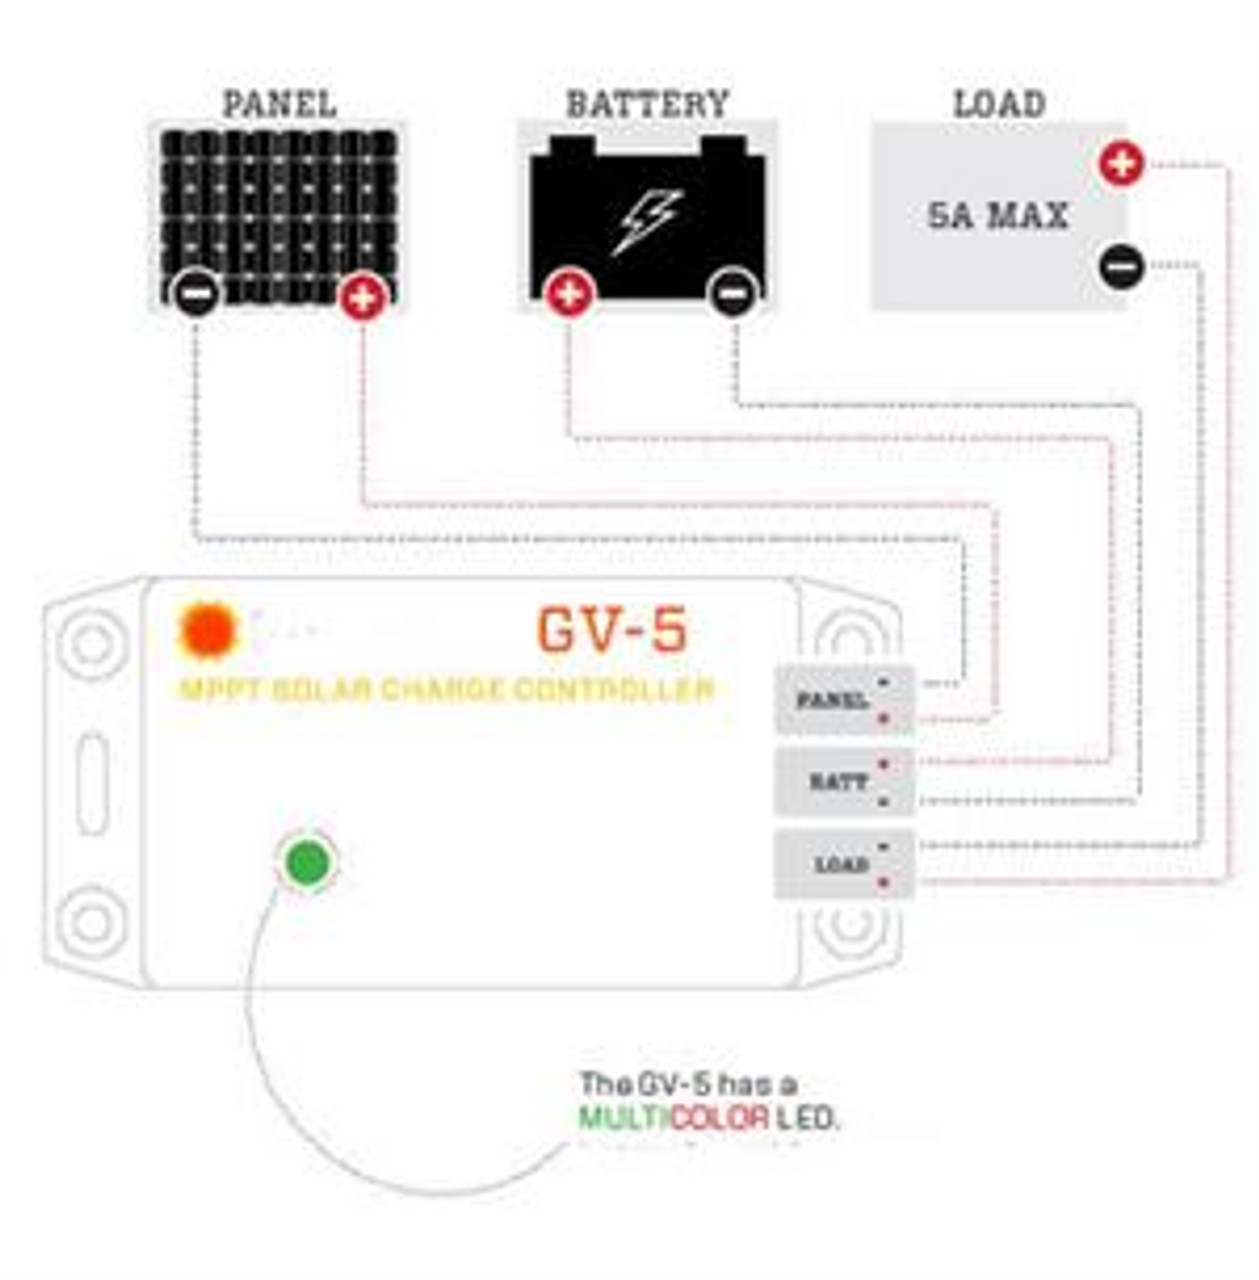 GV-5 | 65W 5A Genasun MPPT Solar Charge Controller - Pb - Diagram